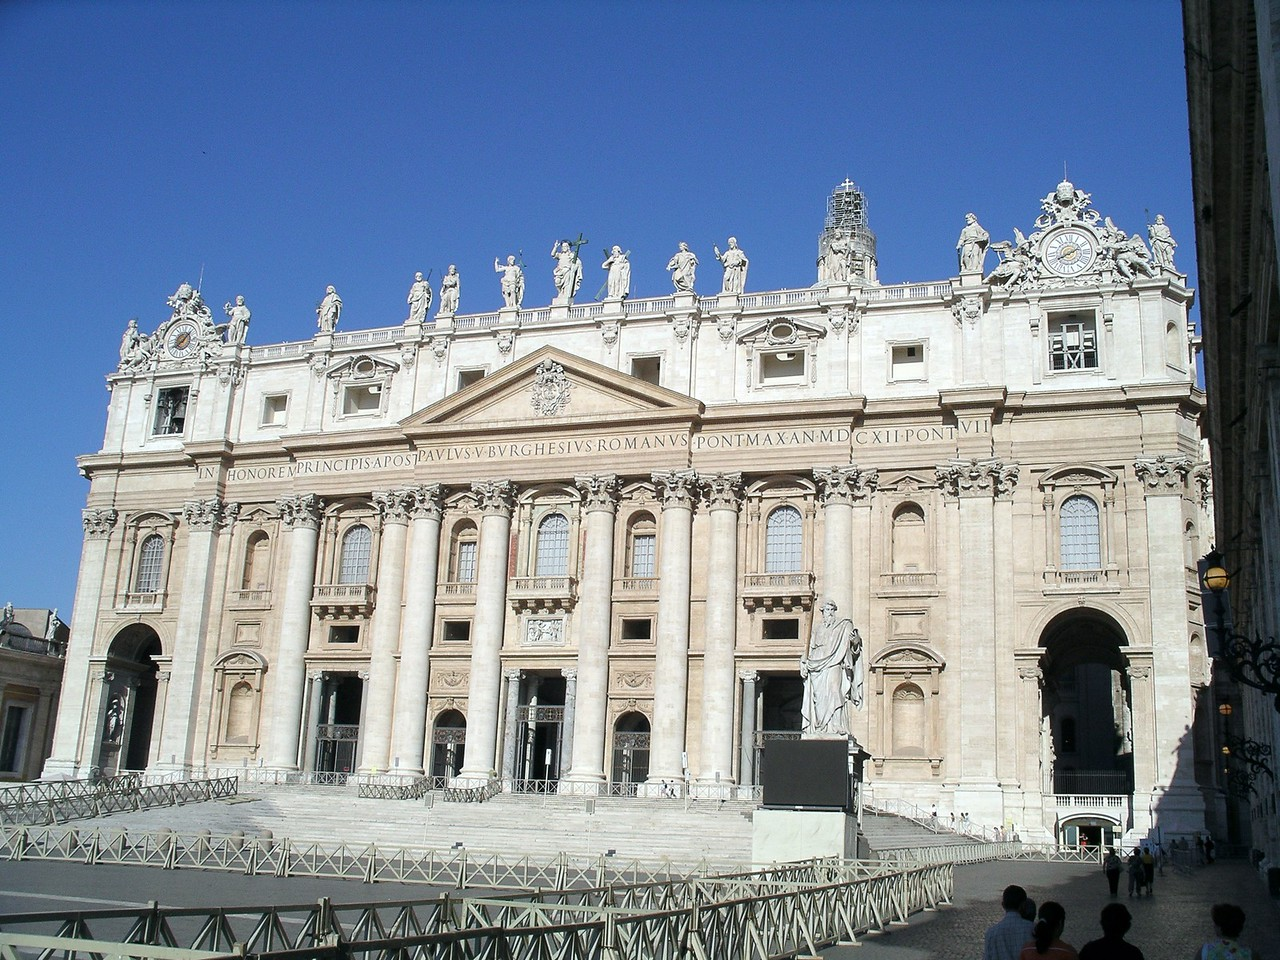 St Peter's Basilica at Rome